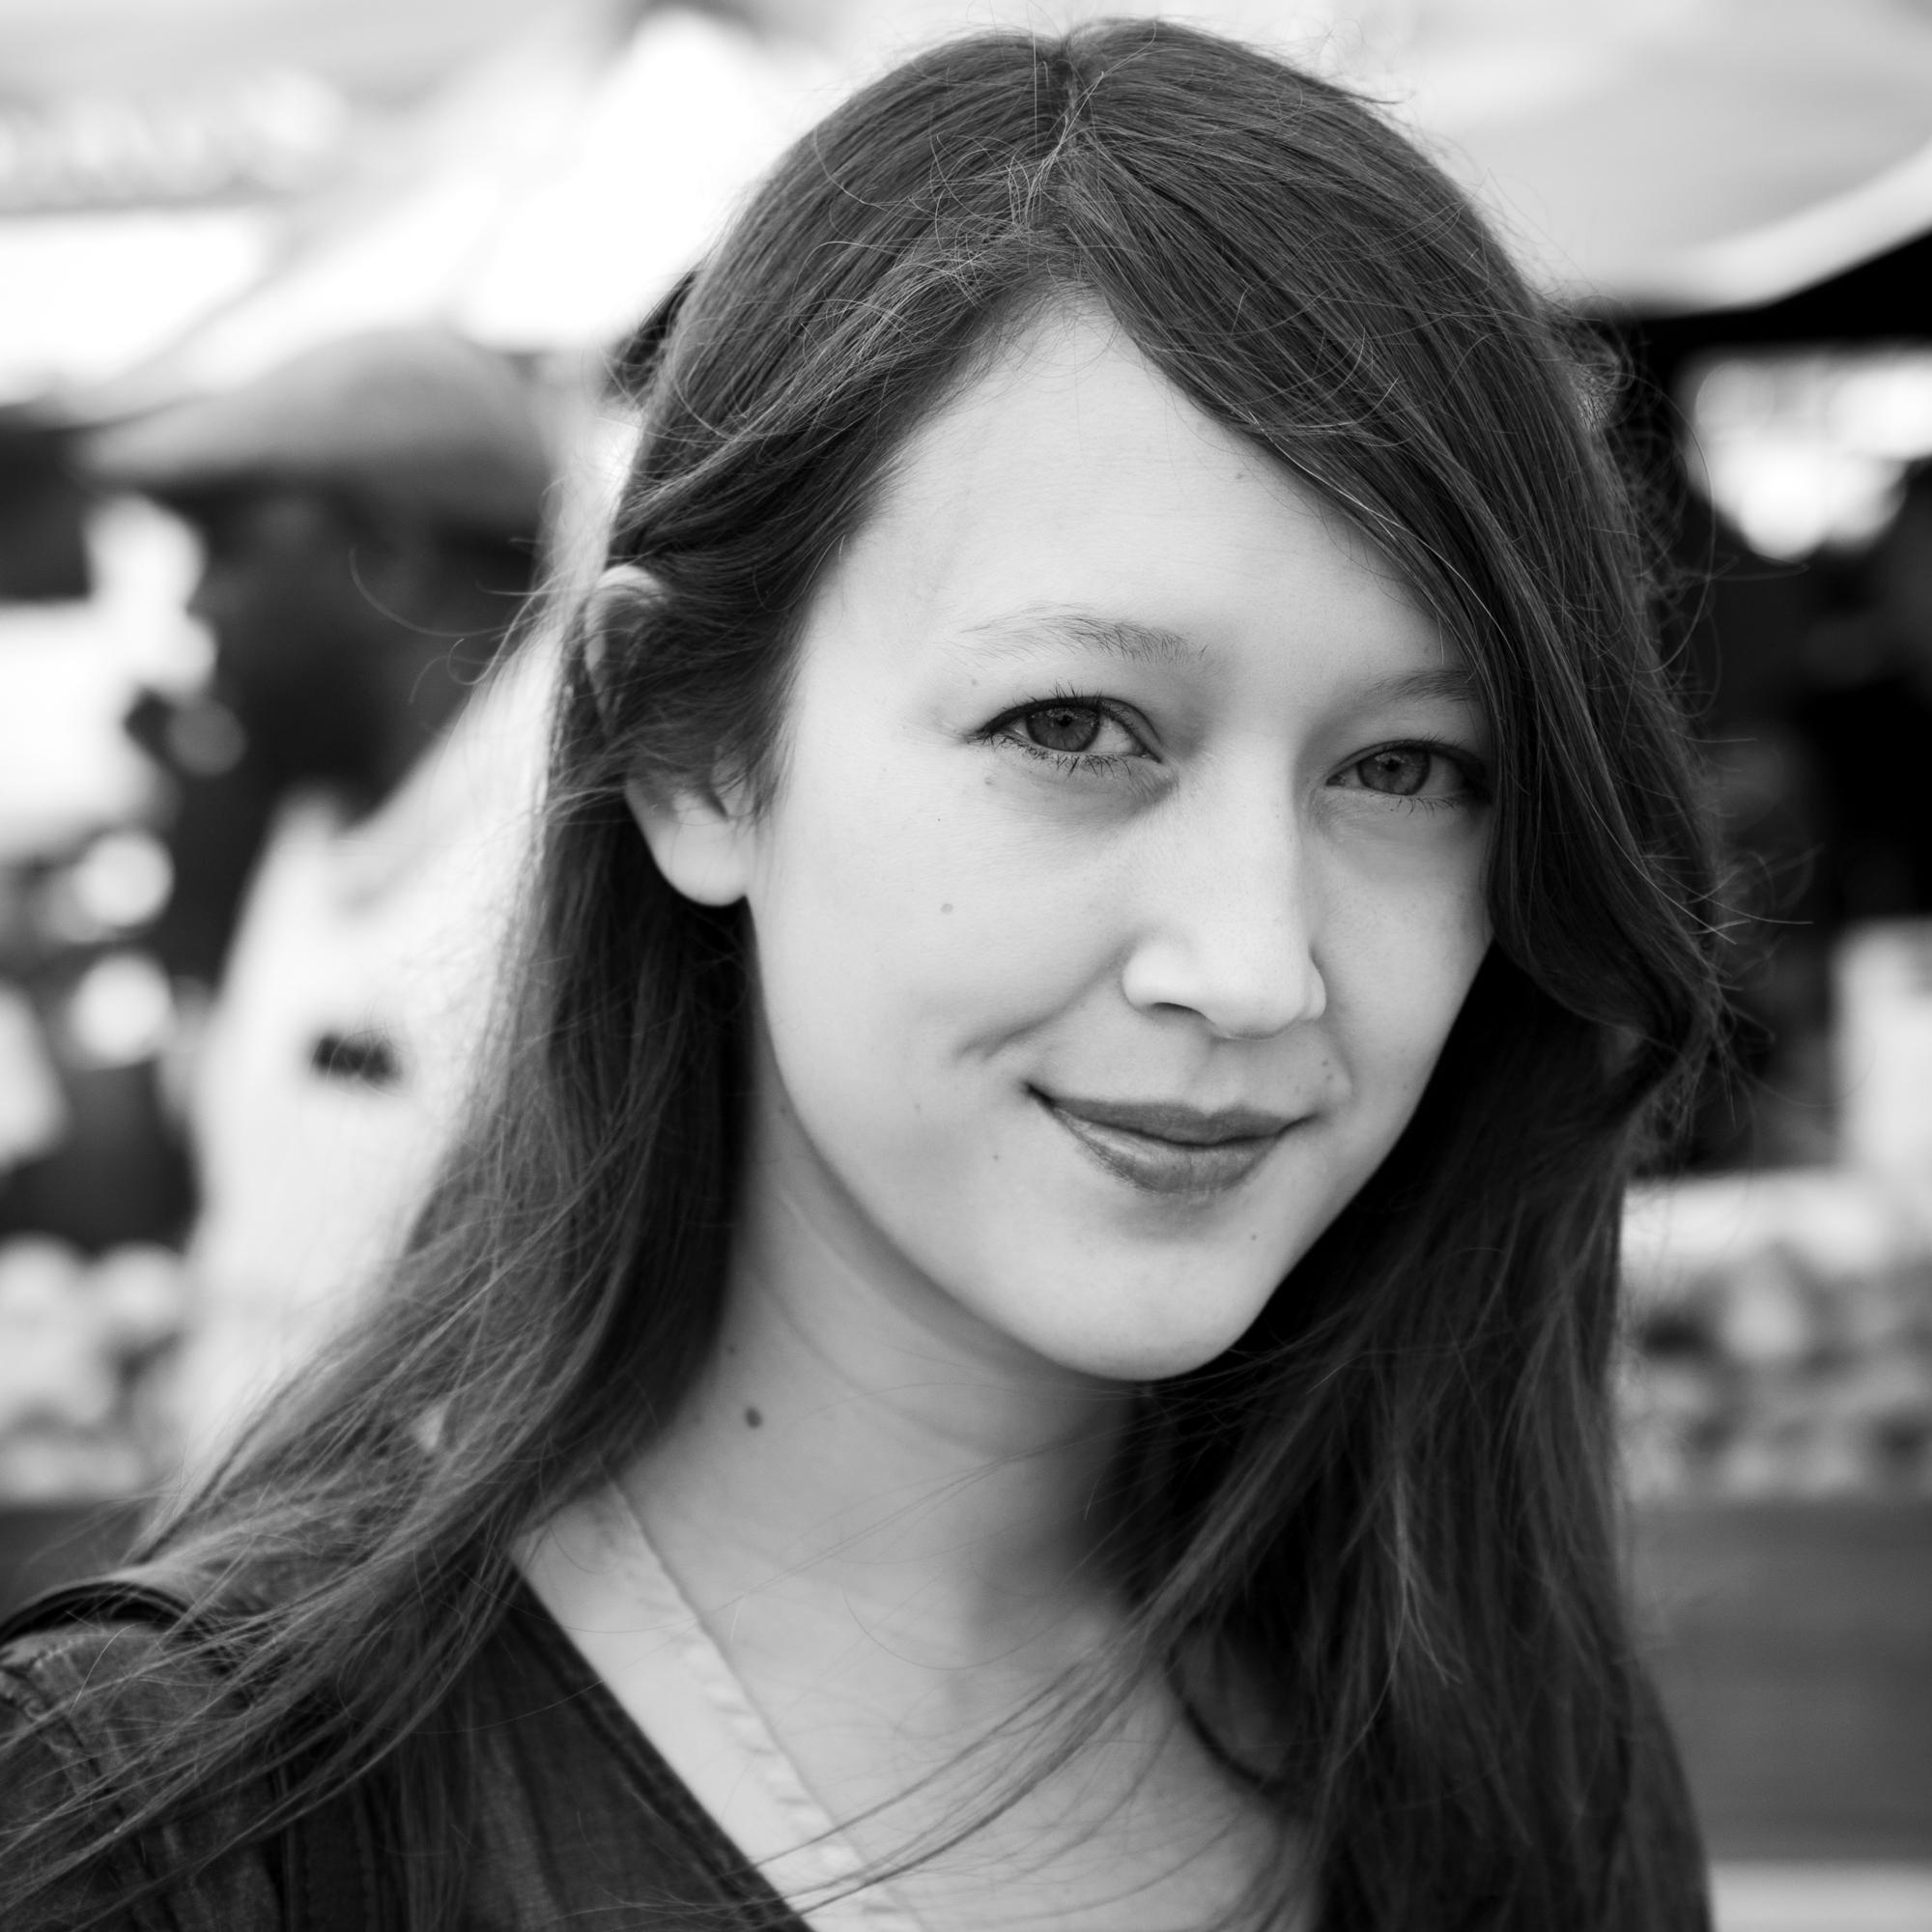 cathy author headshot black and white-8458.jpg